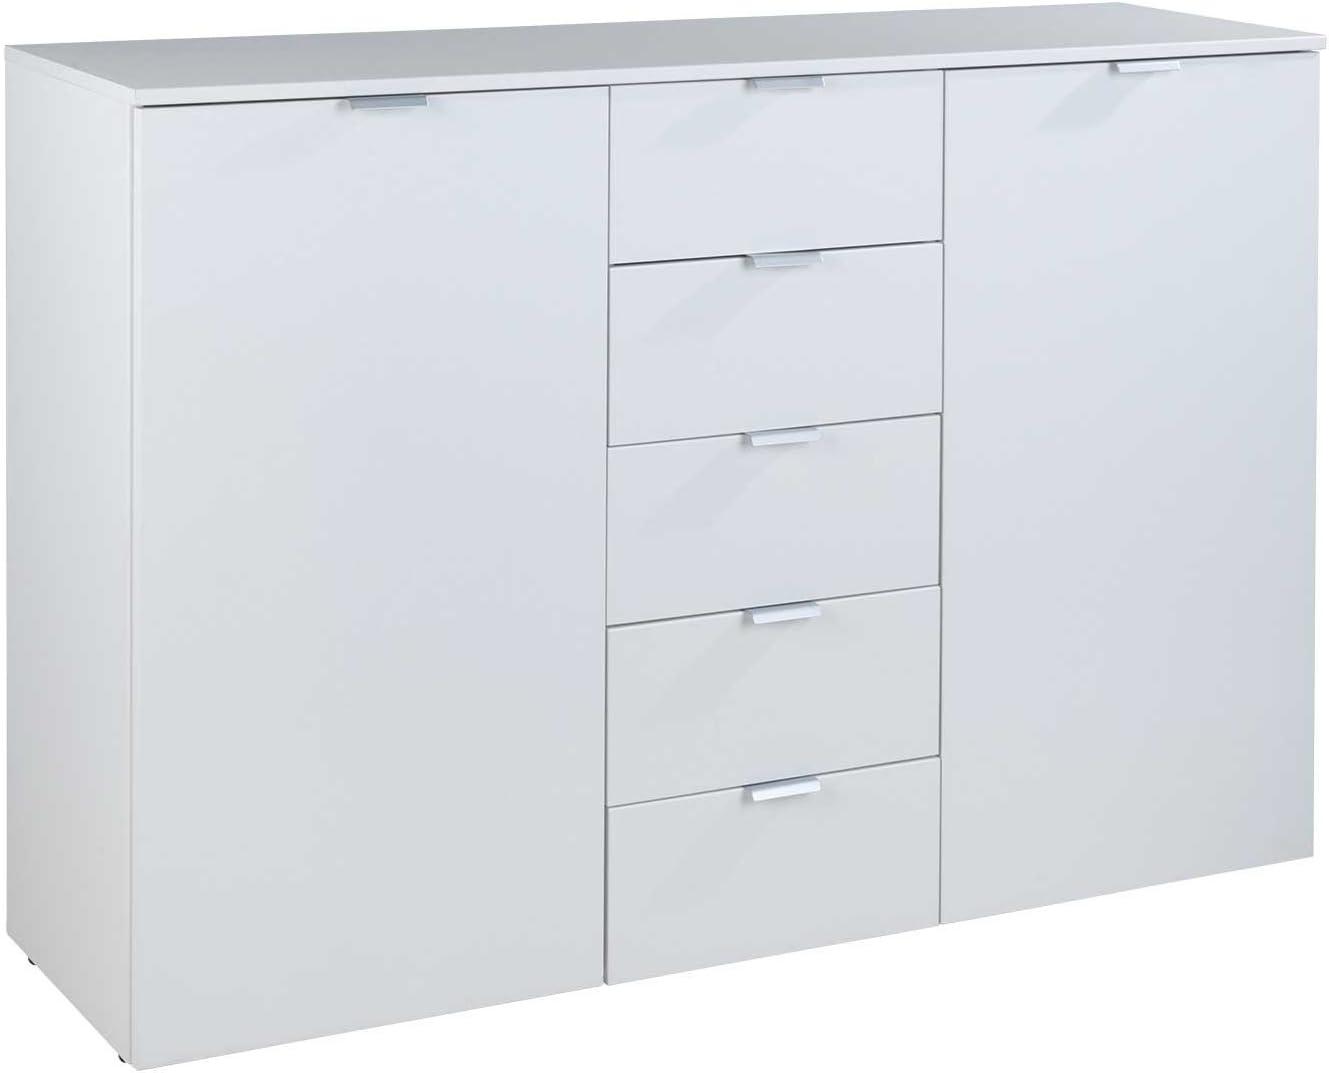 Multipurpose Sanford 3 Polar White 2 Door 5 Drawer Sideboard Amazon De Küche Haushalt